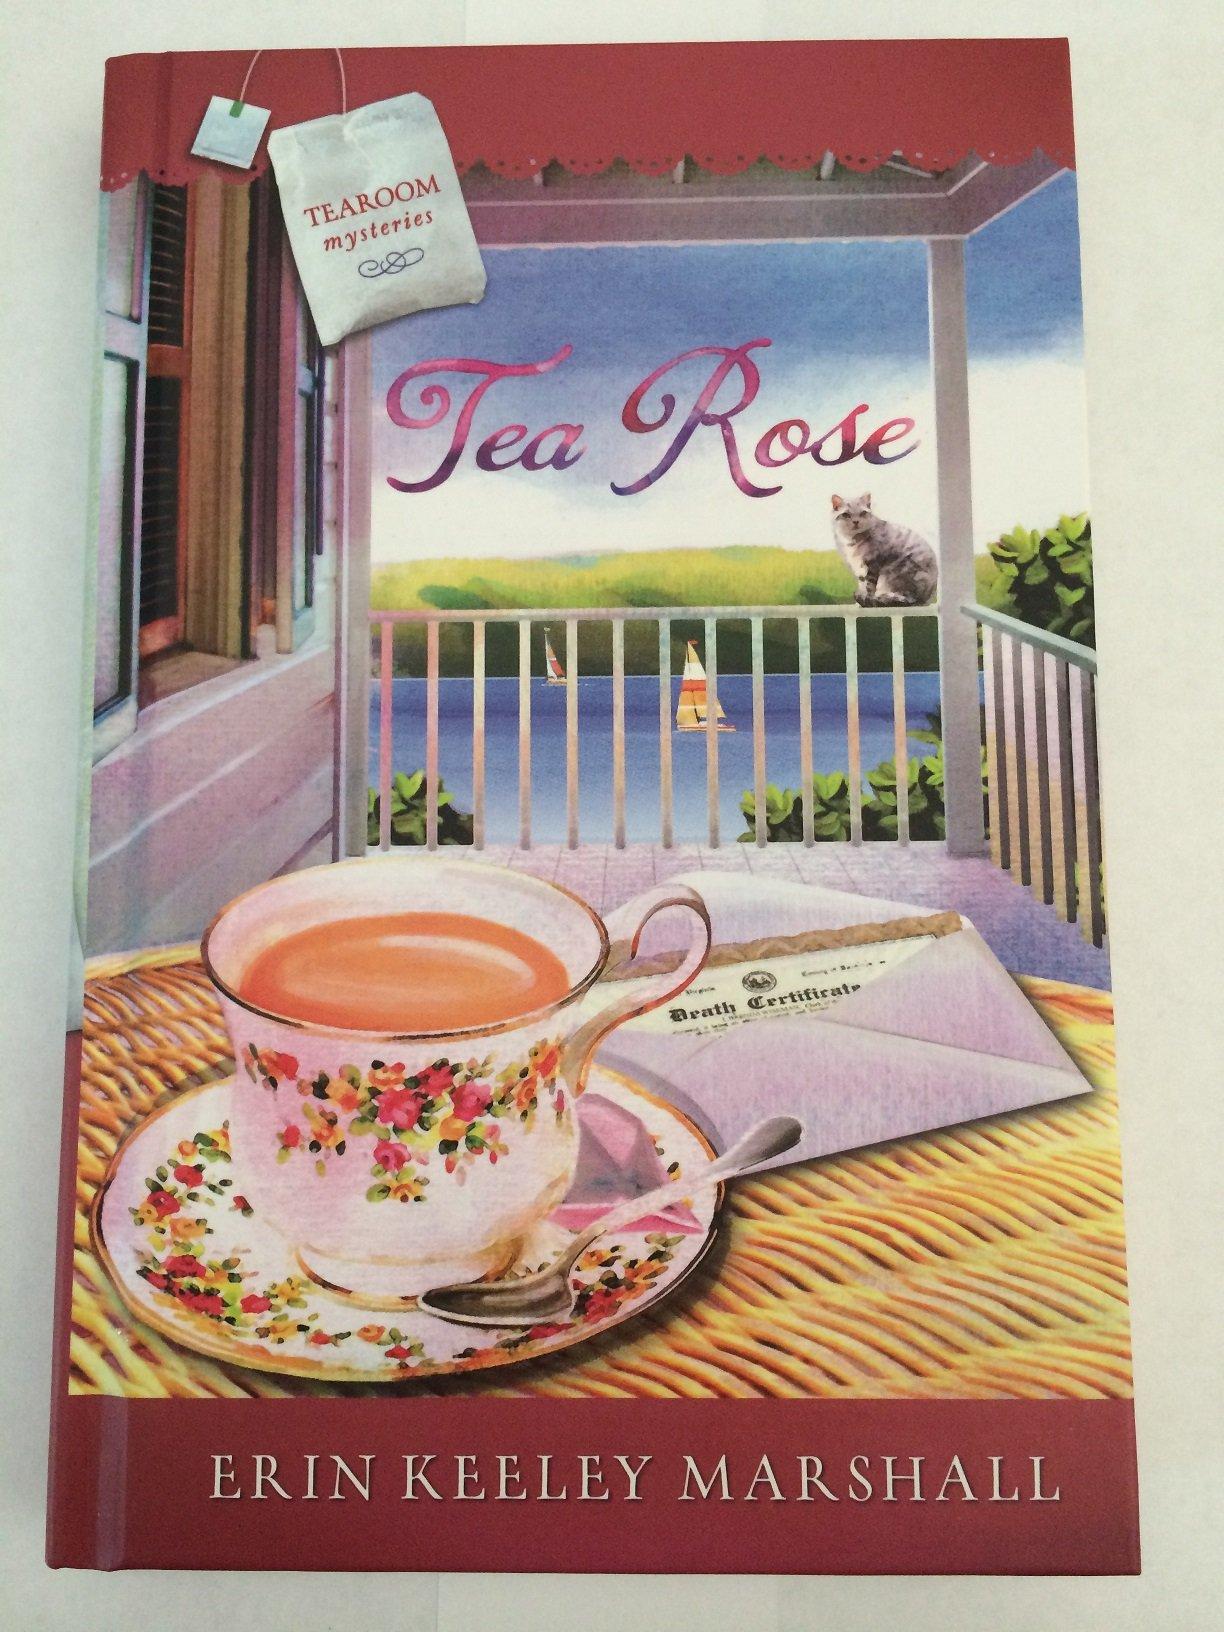 TeaRoom Mysteries Tea Rose Guideposts ebook by Erin Keeley Marshall